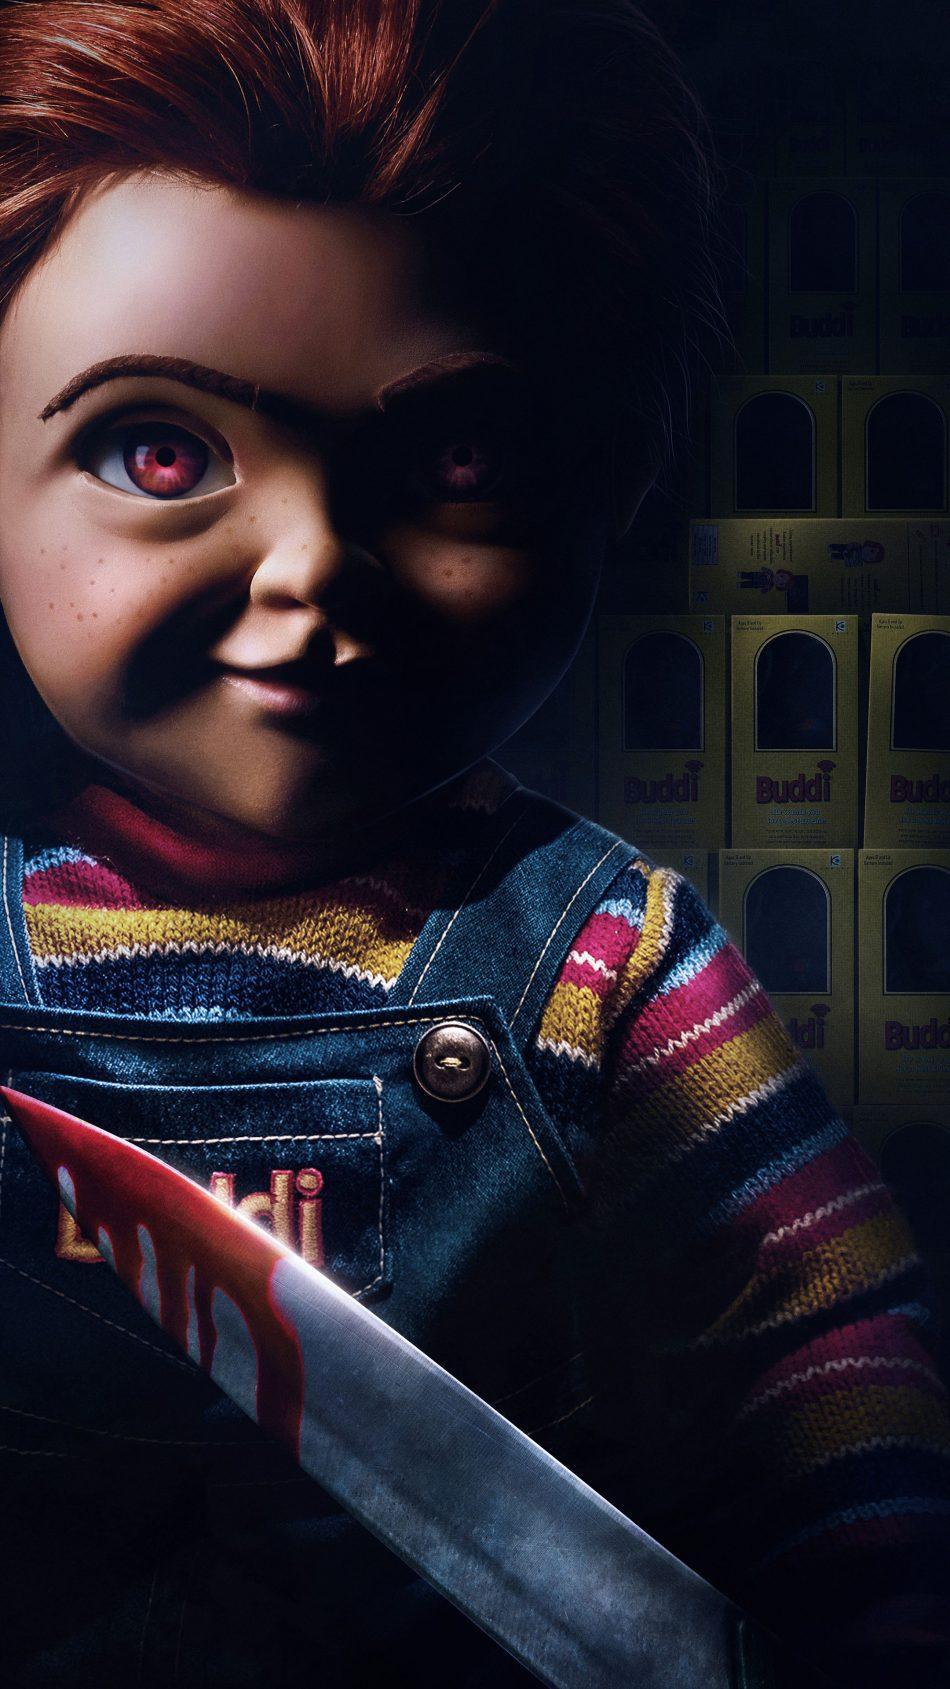 Child's Play 2019 4K Ultra HD Mobile Wallpaper